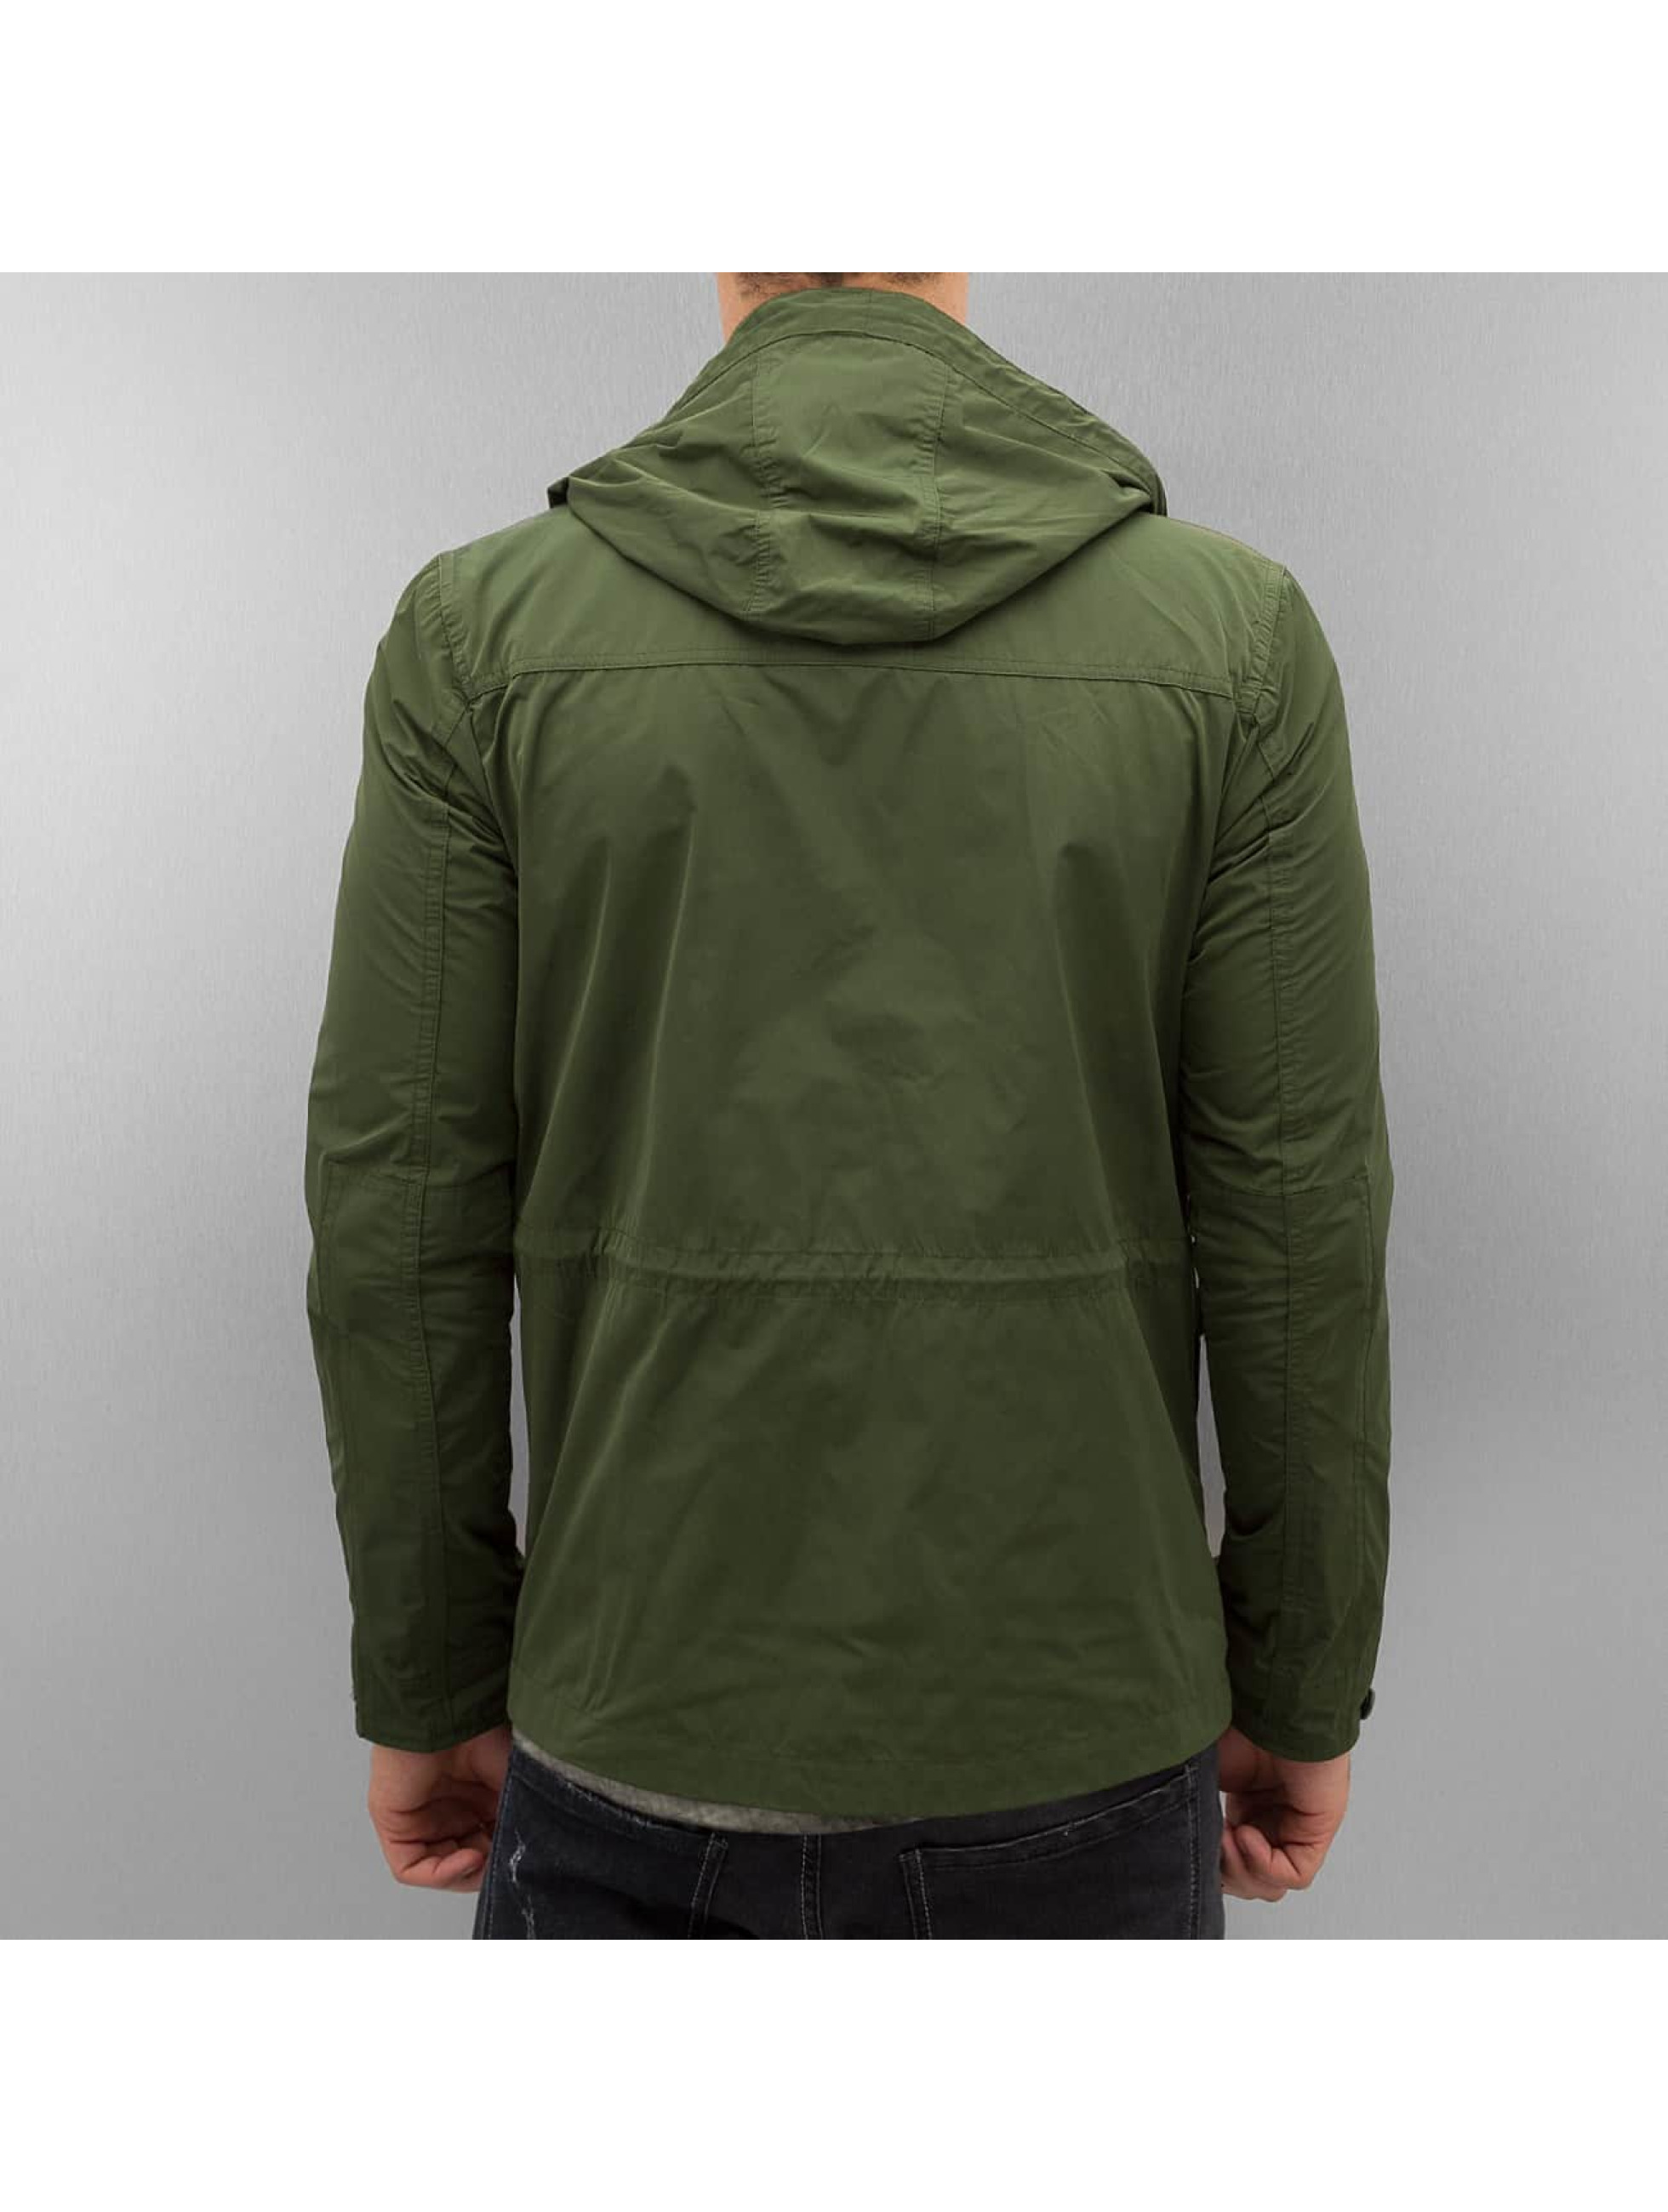 Amsterdenim Демисезонная куртка Sander зеленый